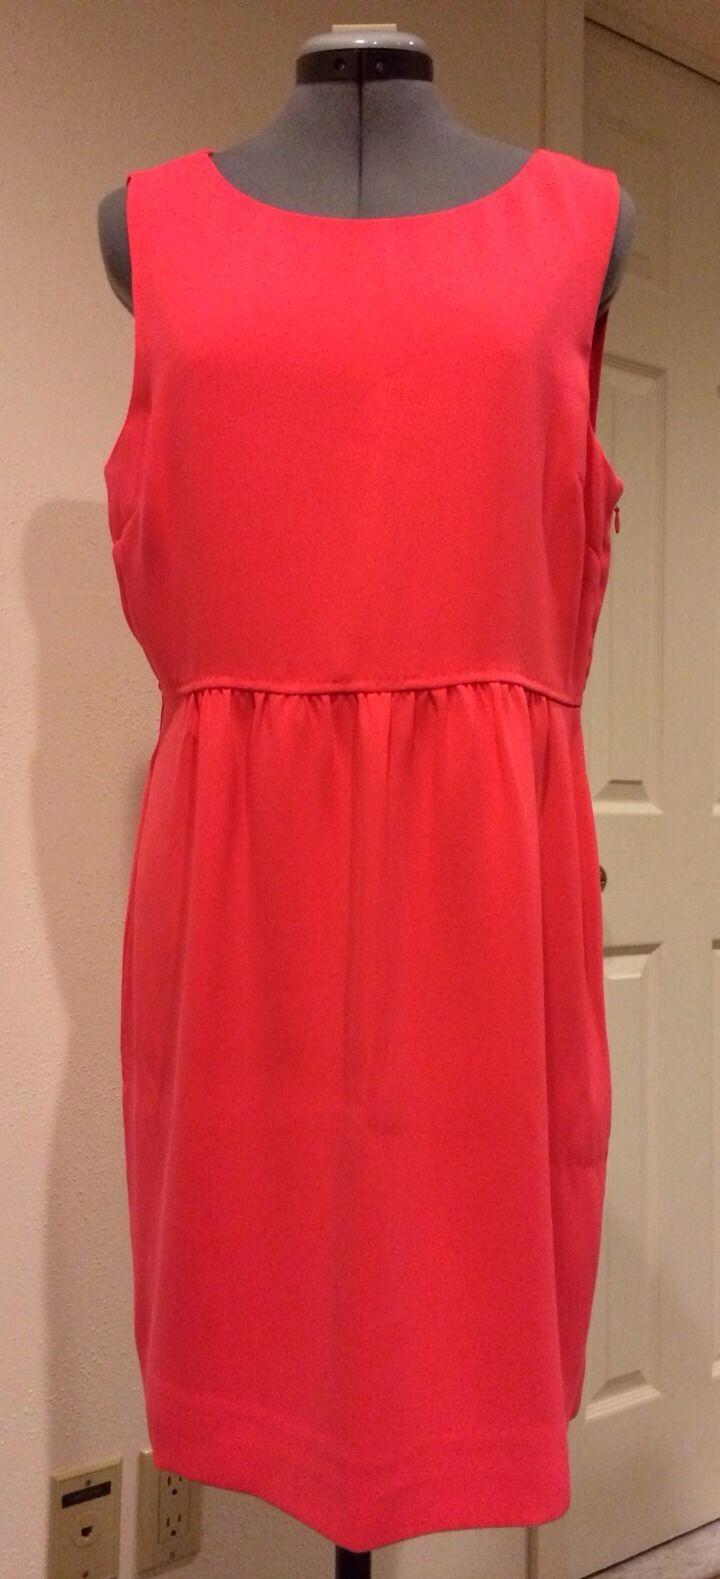 NWT NWT NWT J.CREW CAMILLE DRESS SIZE 12 9e048a